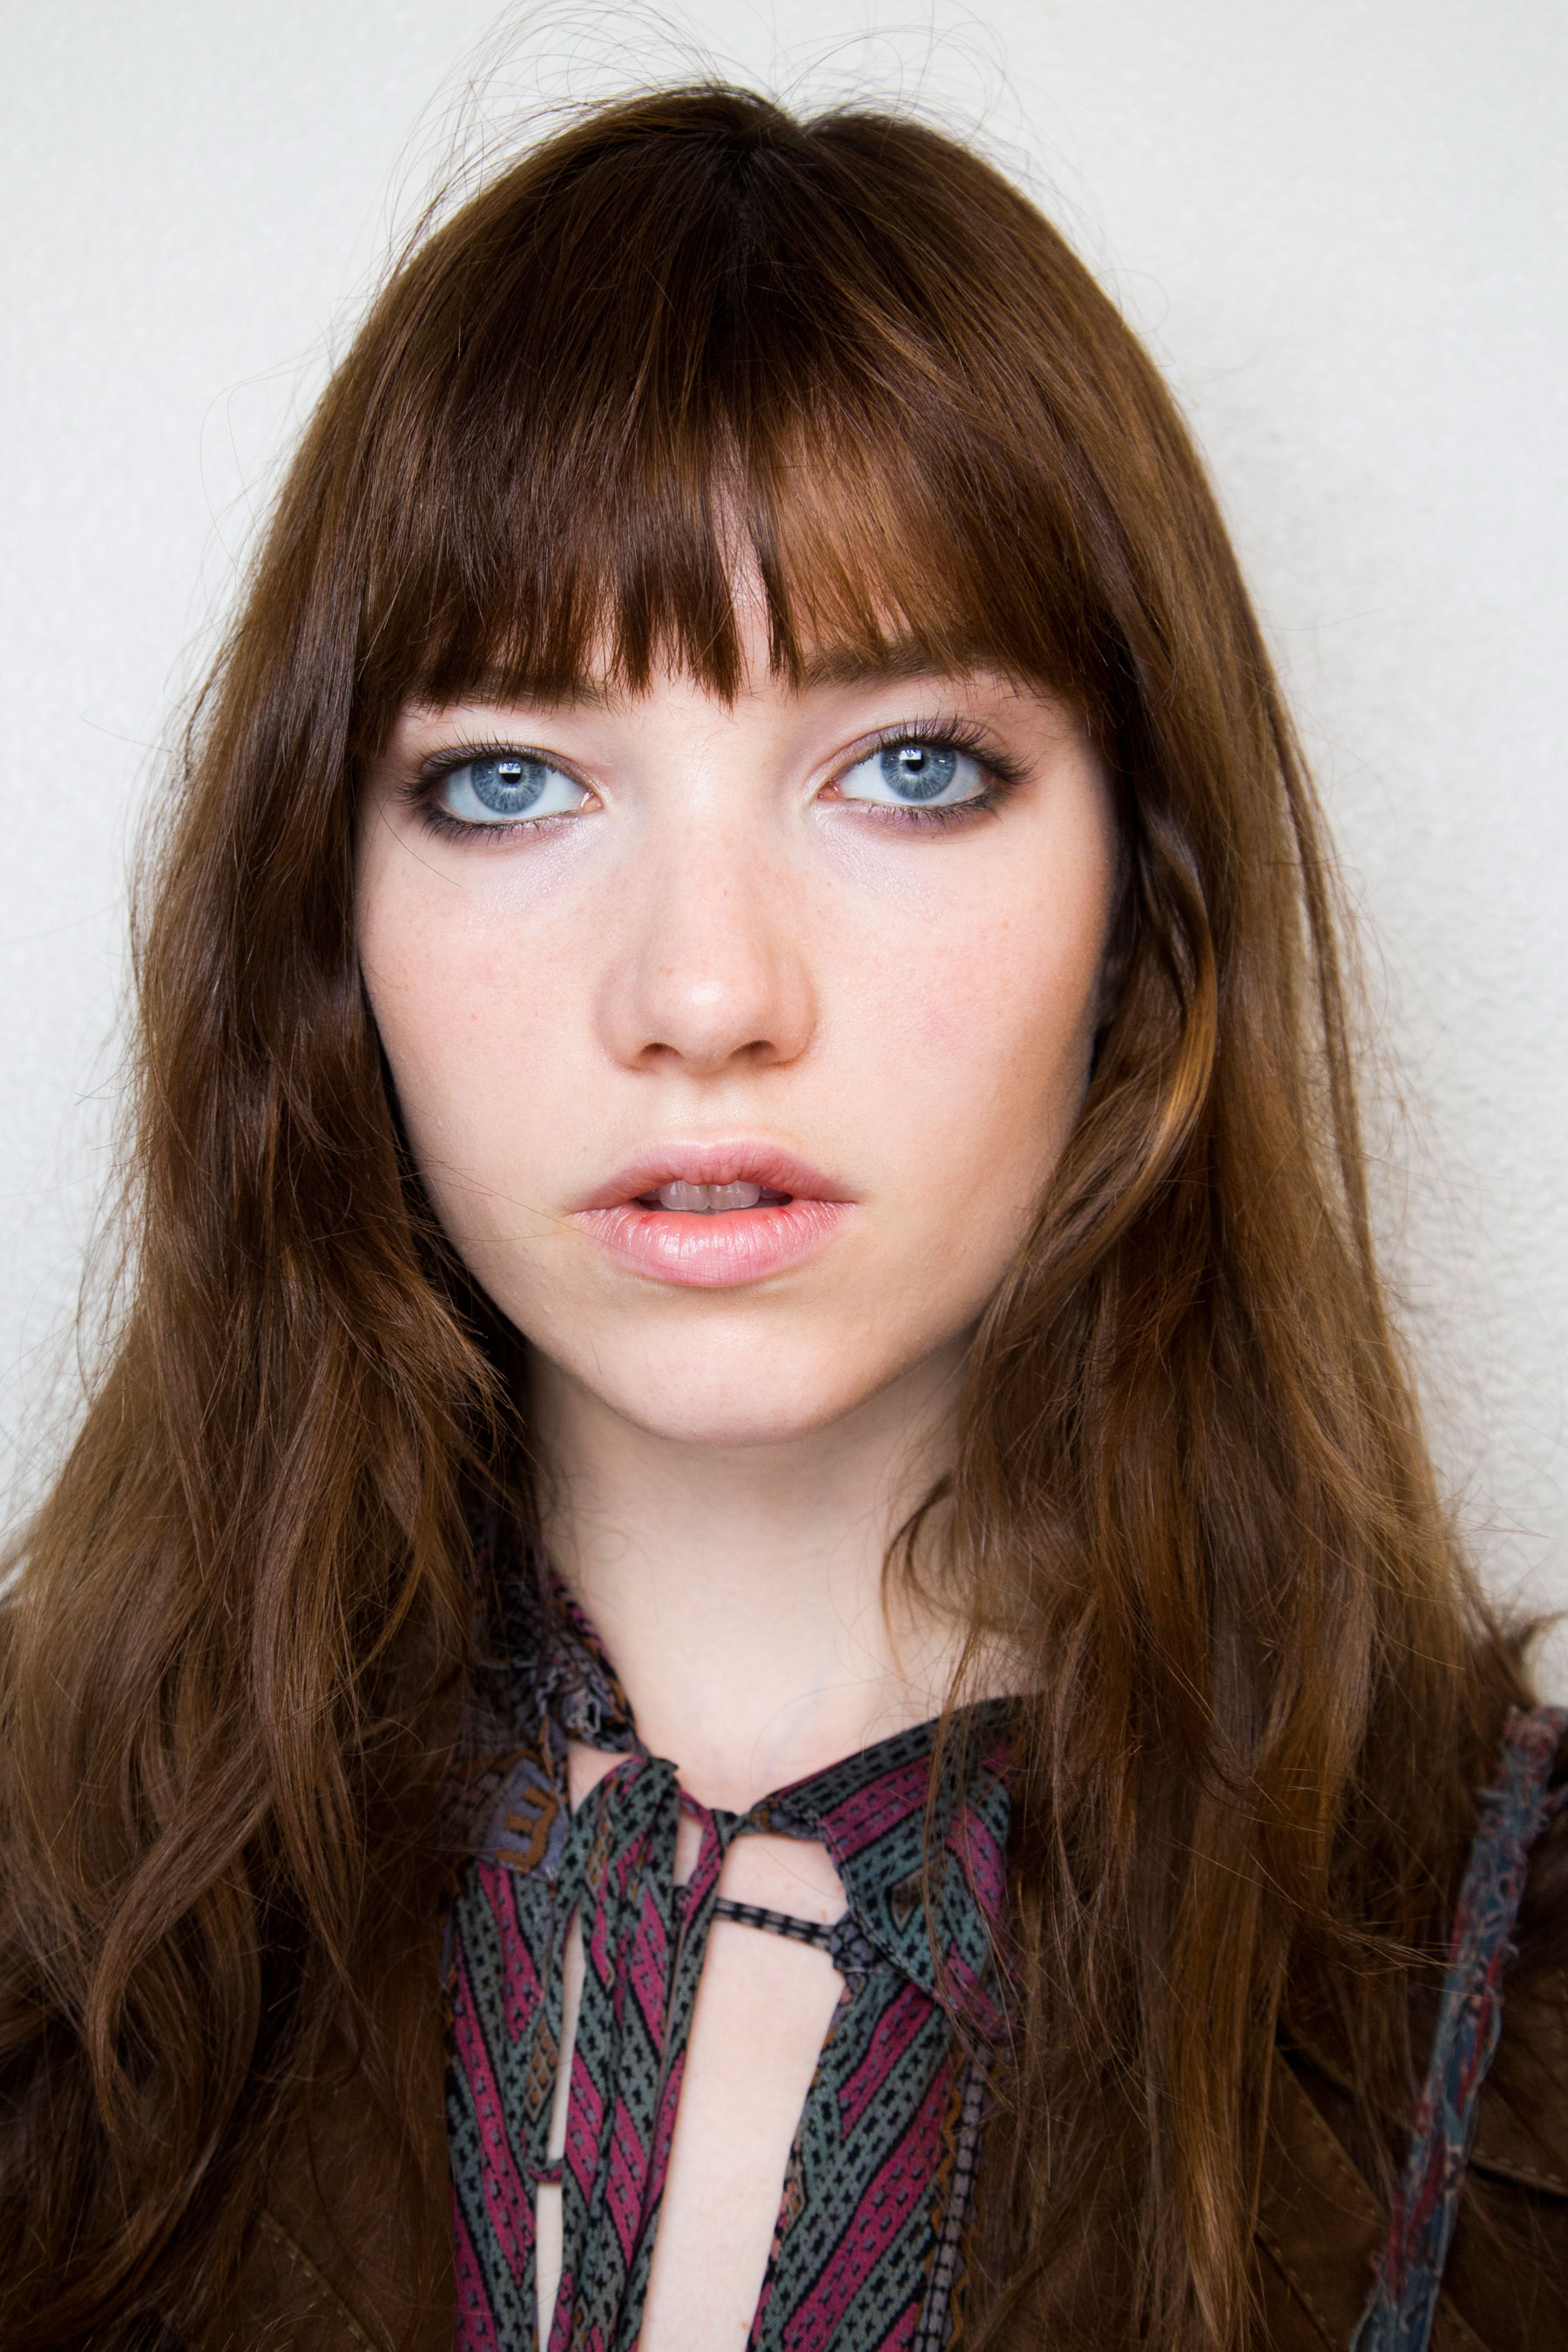 Chloe-spring-2016-beauty-fashion-show-the-impression-103